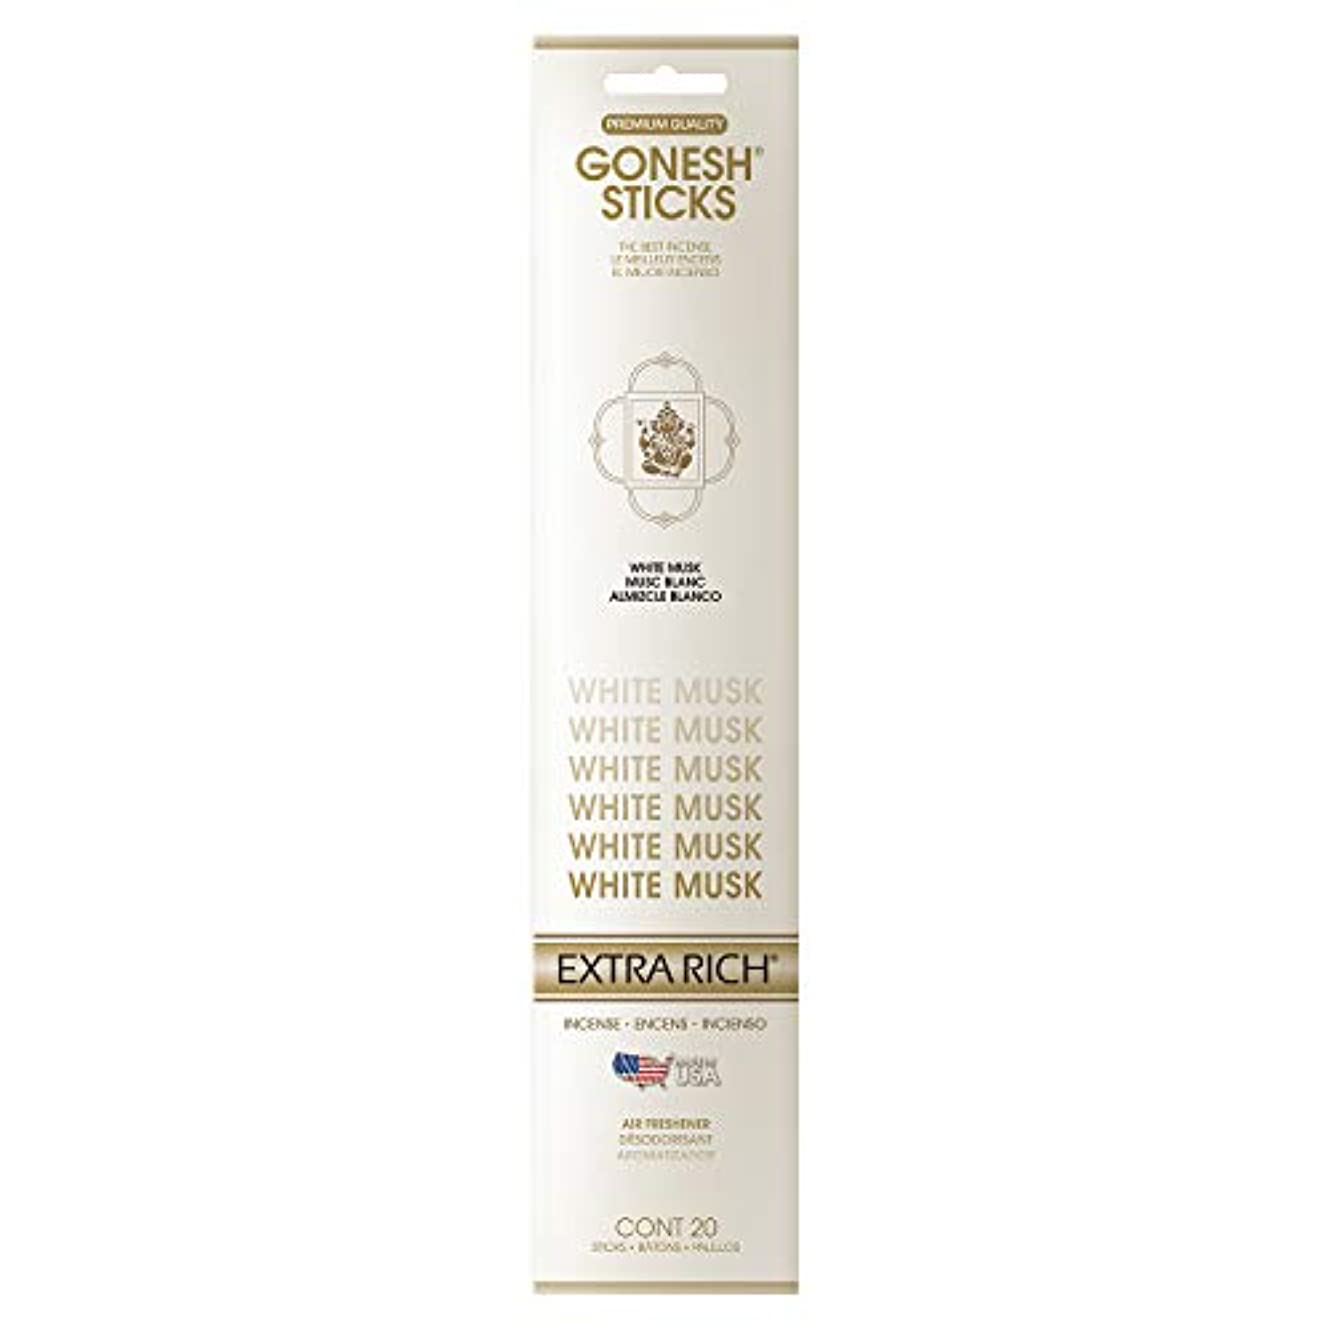 GONESH インセンススティック ホワイトムスク(ホワイトフローラルの甘さとシャボンの清潔感ある香り)